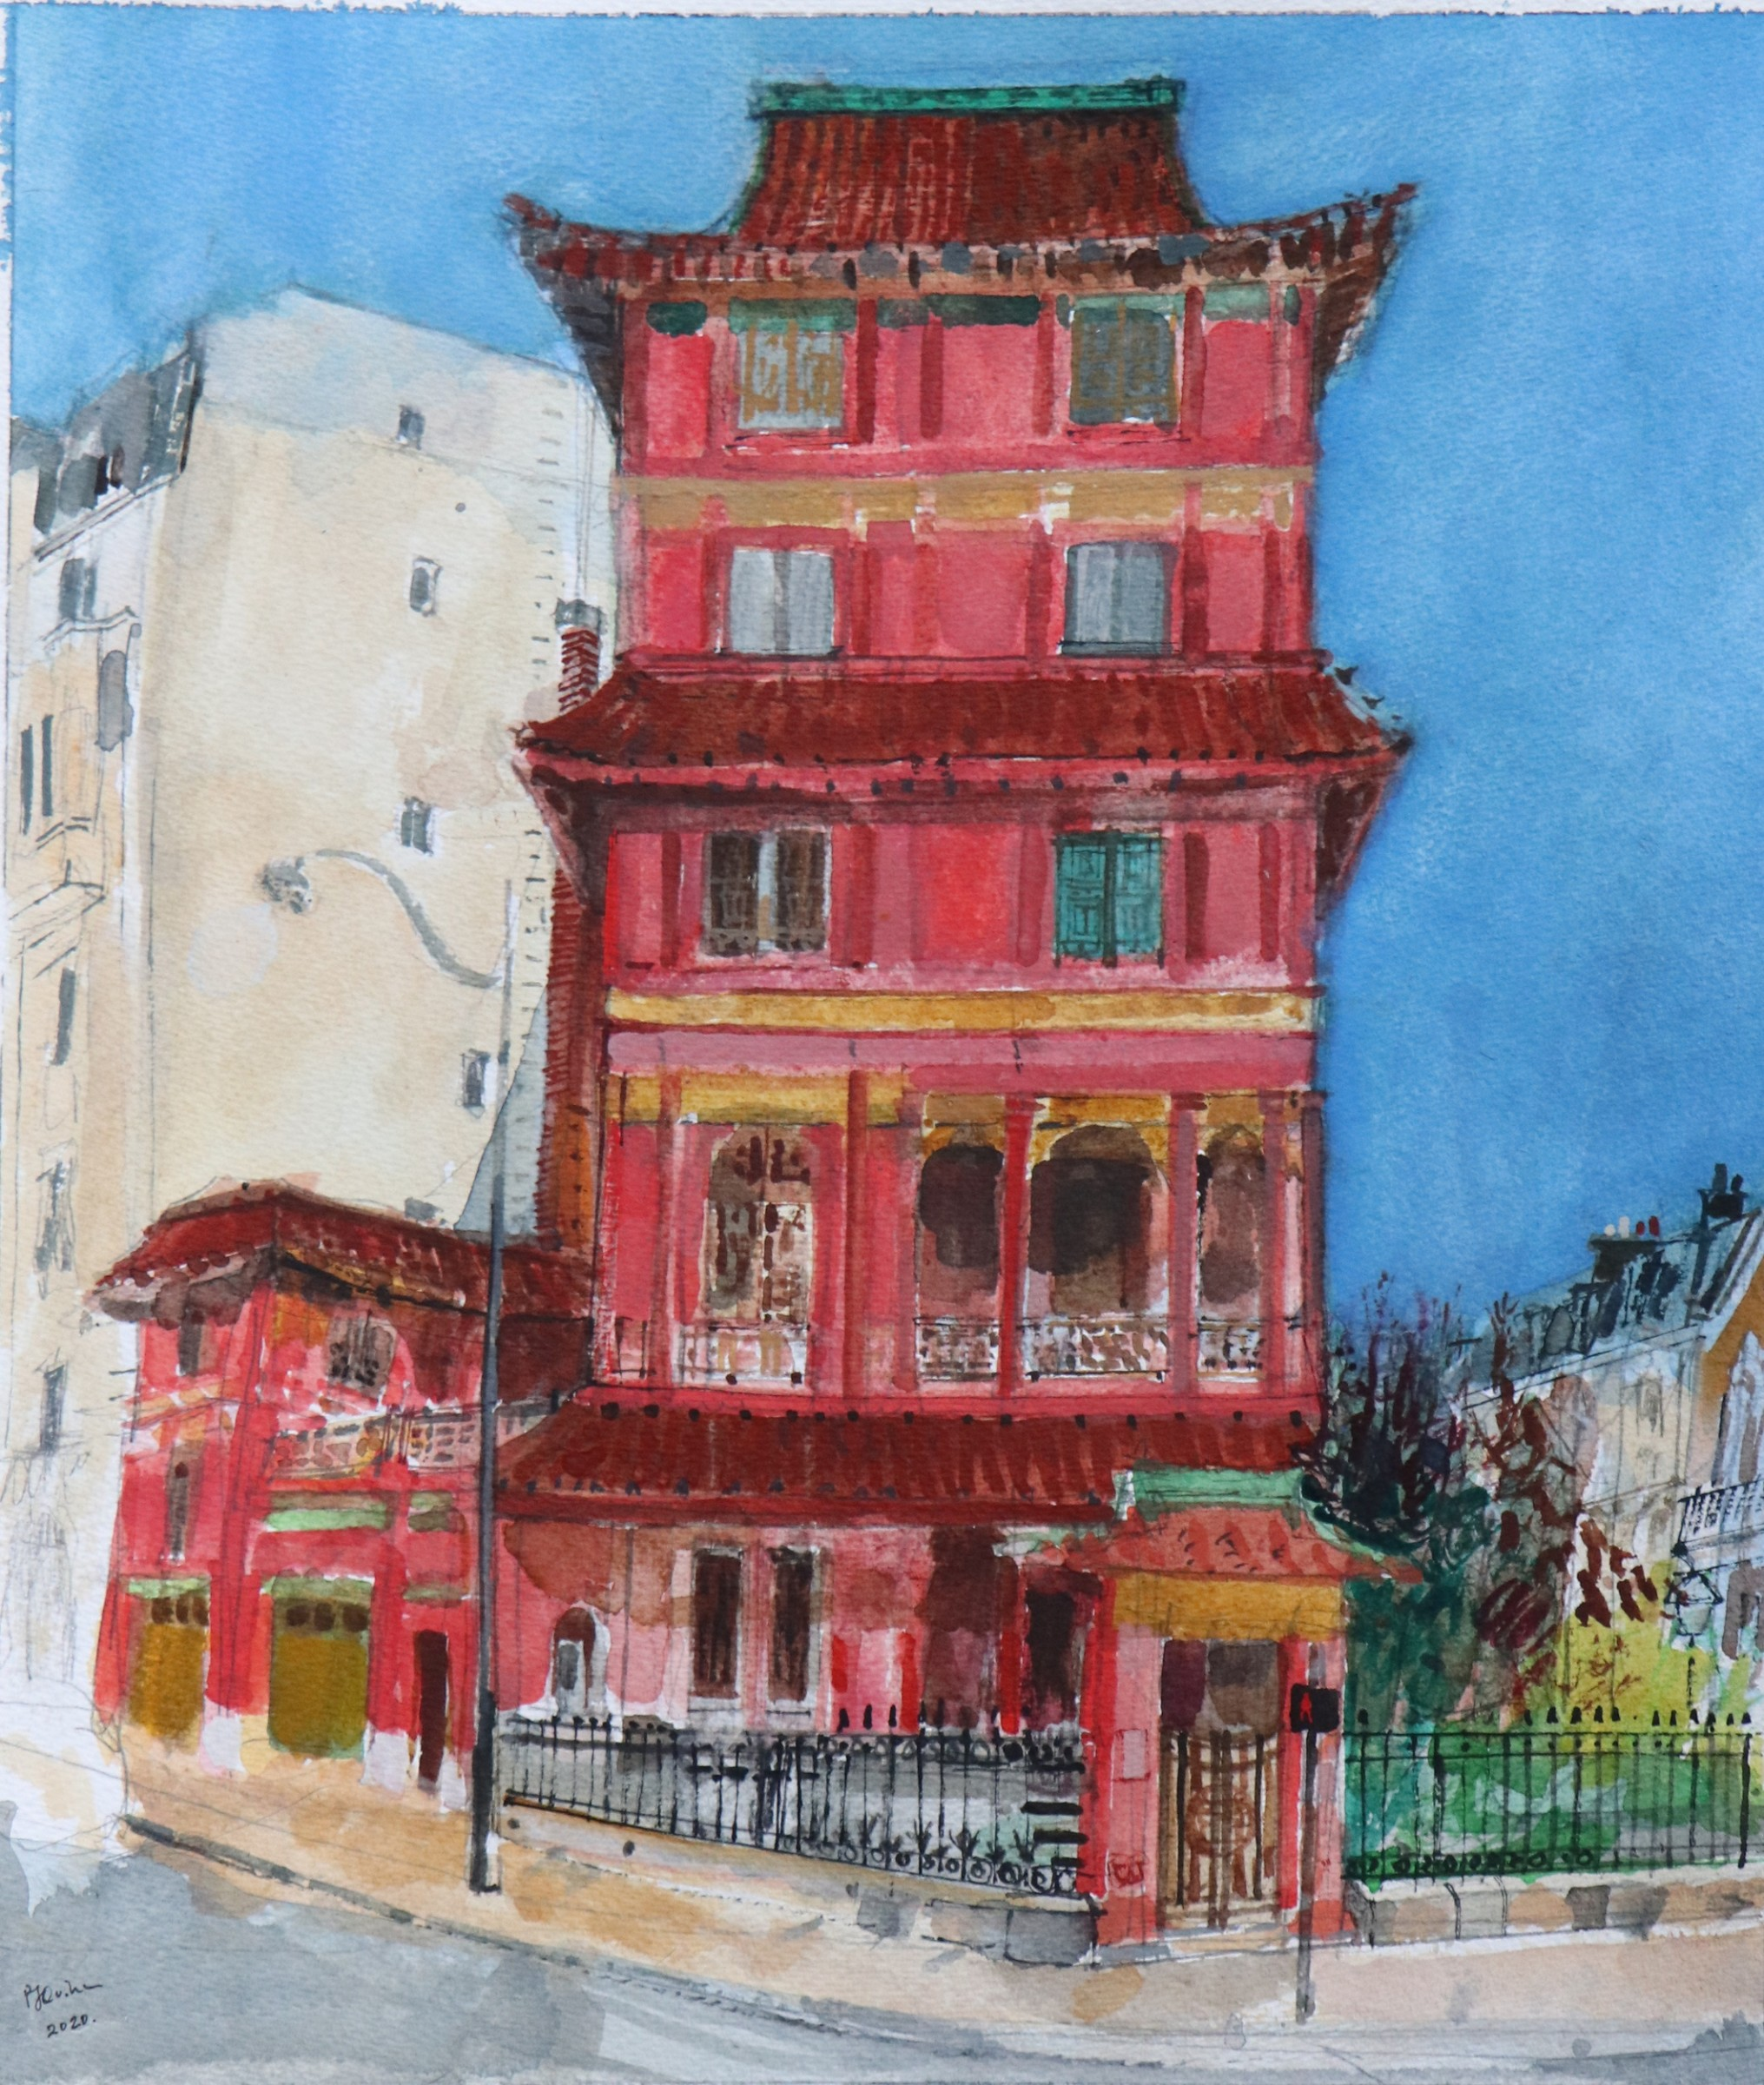 "<span class=""link fancybox-details-link""><a href=""/artists/96-peter-quinn/works/12295-peter-quinn-paris-pagoda/"">View Detail Page</a></span><div class=""artist""><span class=""artist""><strong>Peter Quinn</strong></span></div><div class=""title""><em>Paris Pagoda</em></div><div class=""medium"">watercolour on paper</div><div class=""dimensions"">Frame: 59 x 50 cm<br /> </div><div class=""price"">£600.00</div>"